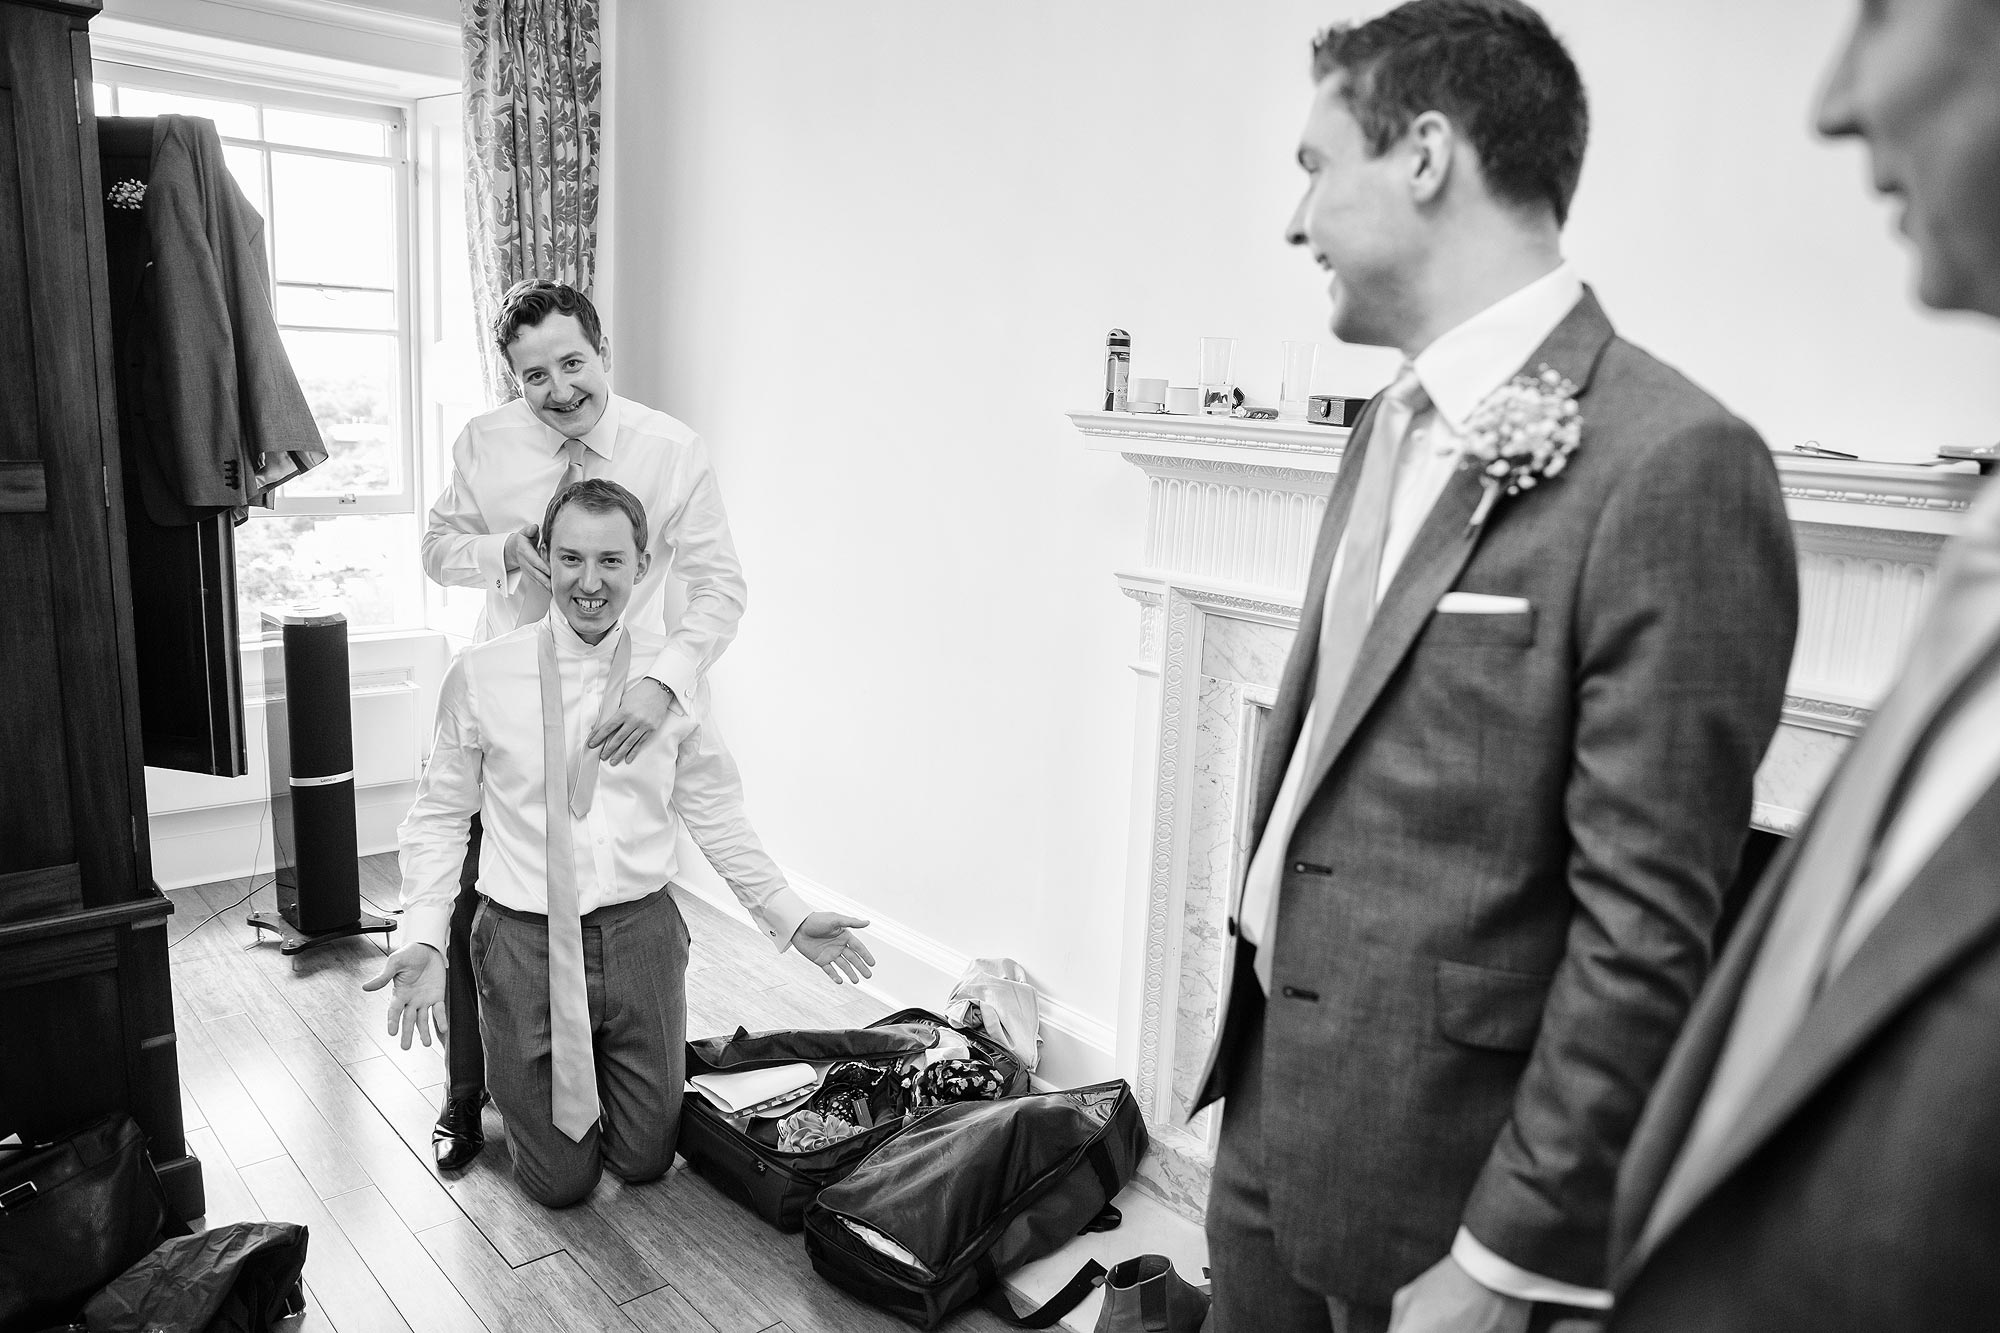 documentary wedding photographer Kerry Morgan